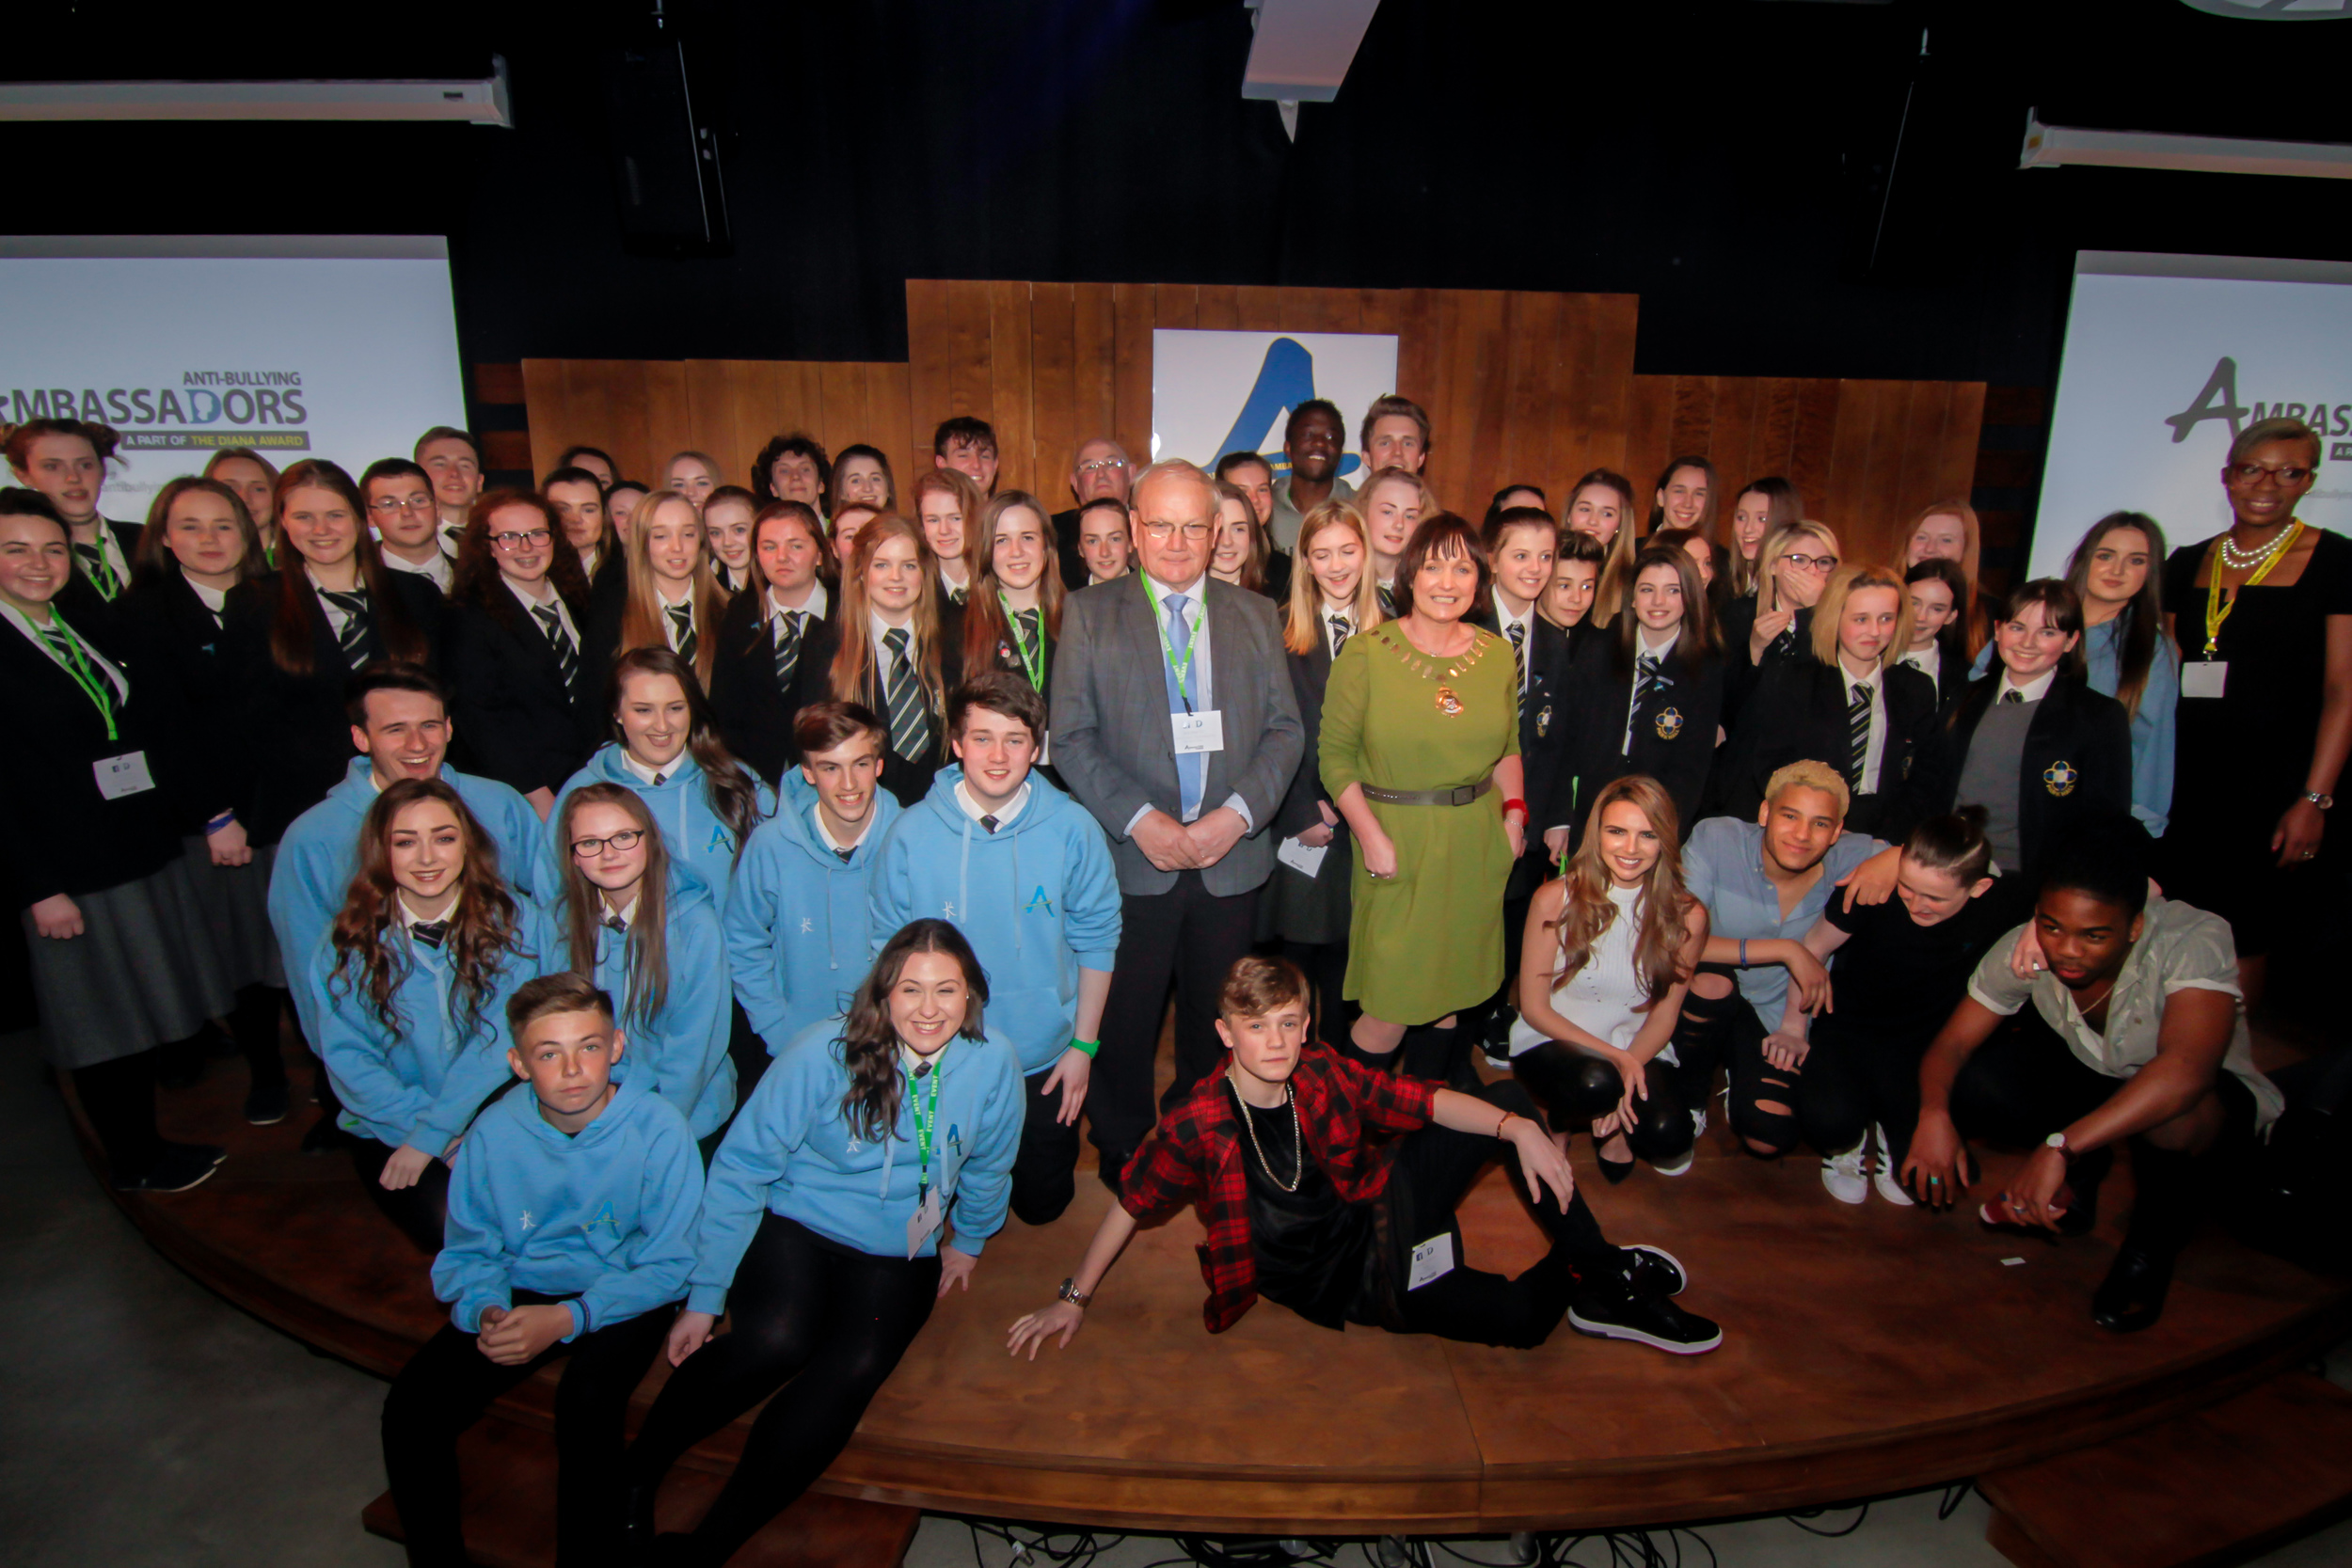 The new Anti-Bullying Ambassador-Diana Award holders